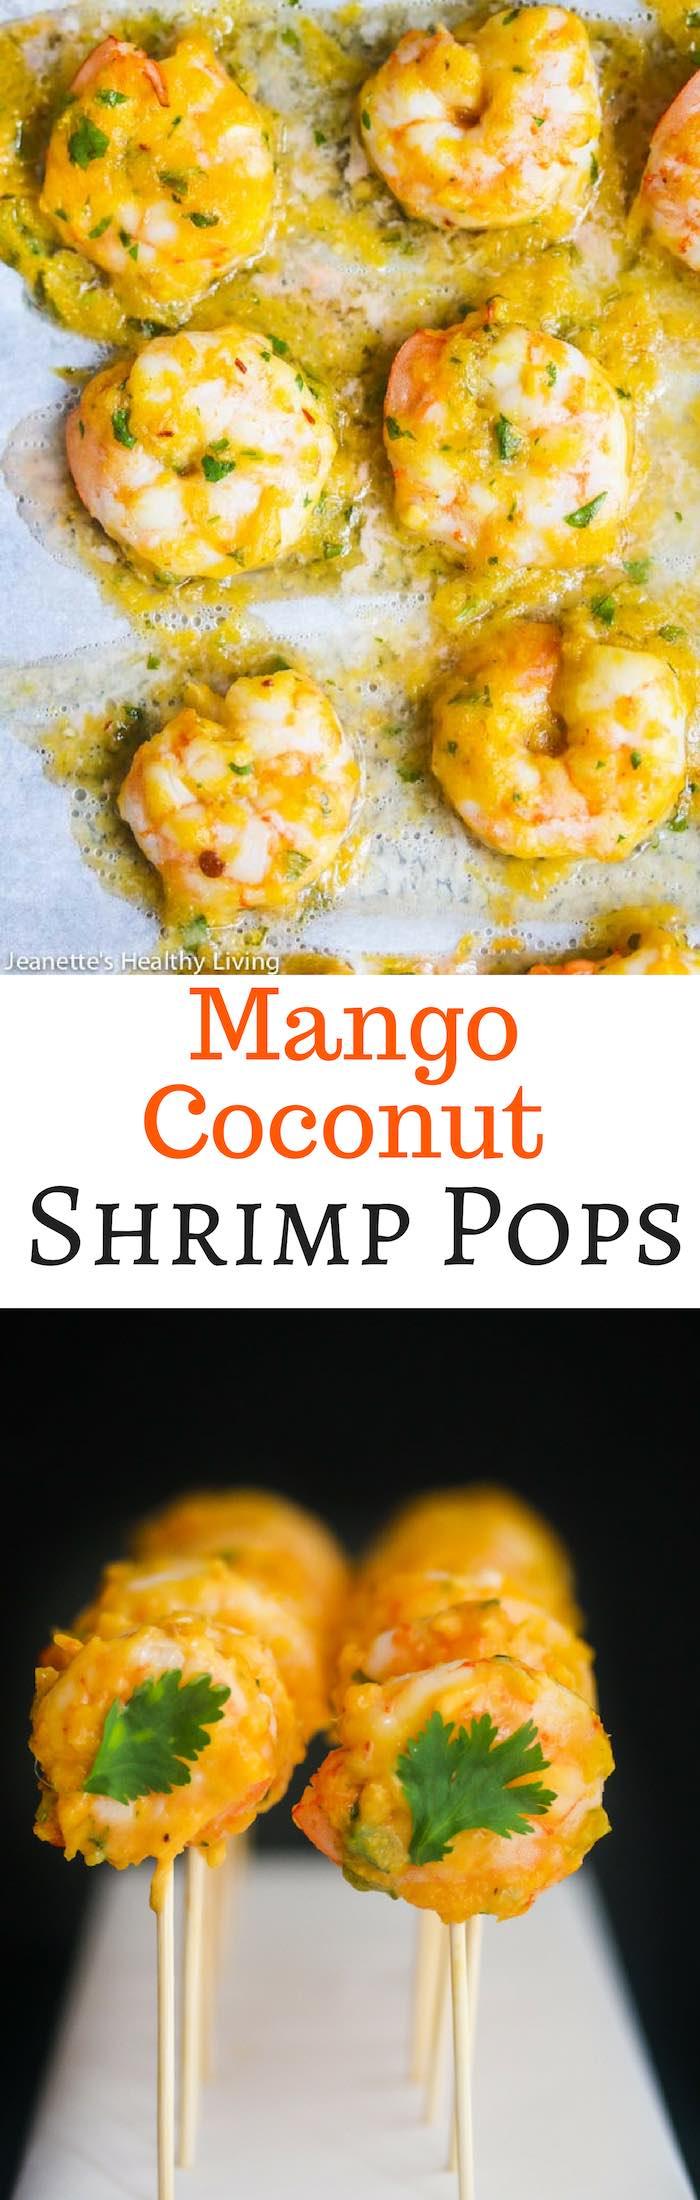 Mango Coconut Shrimp Pops - a delicious tropical themed shrimp cocktail